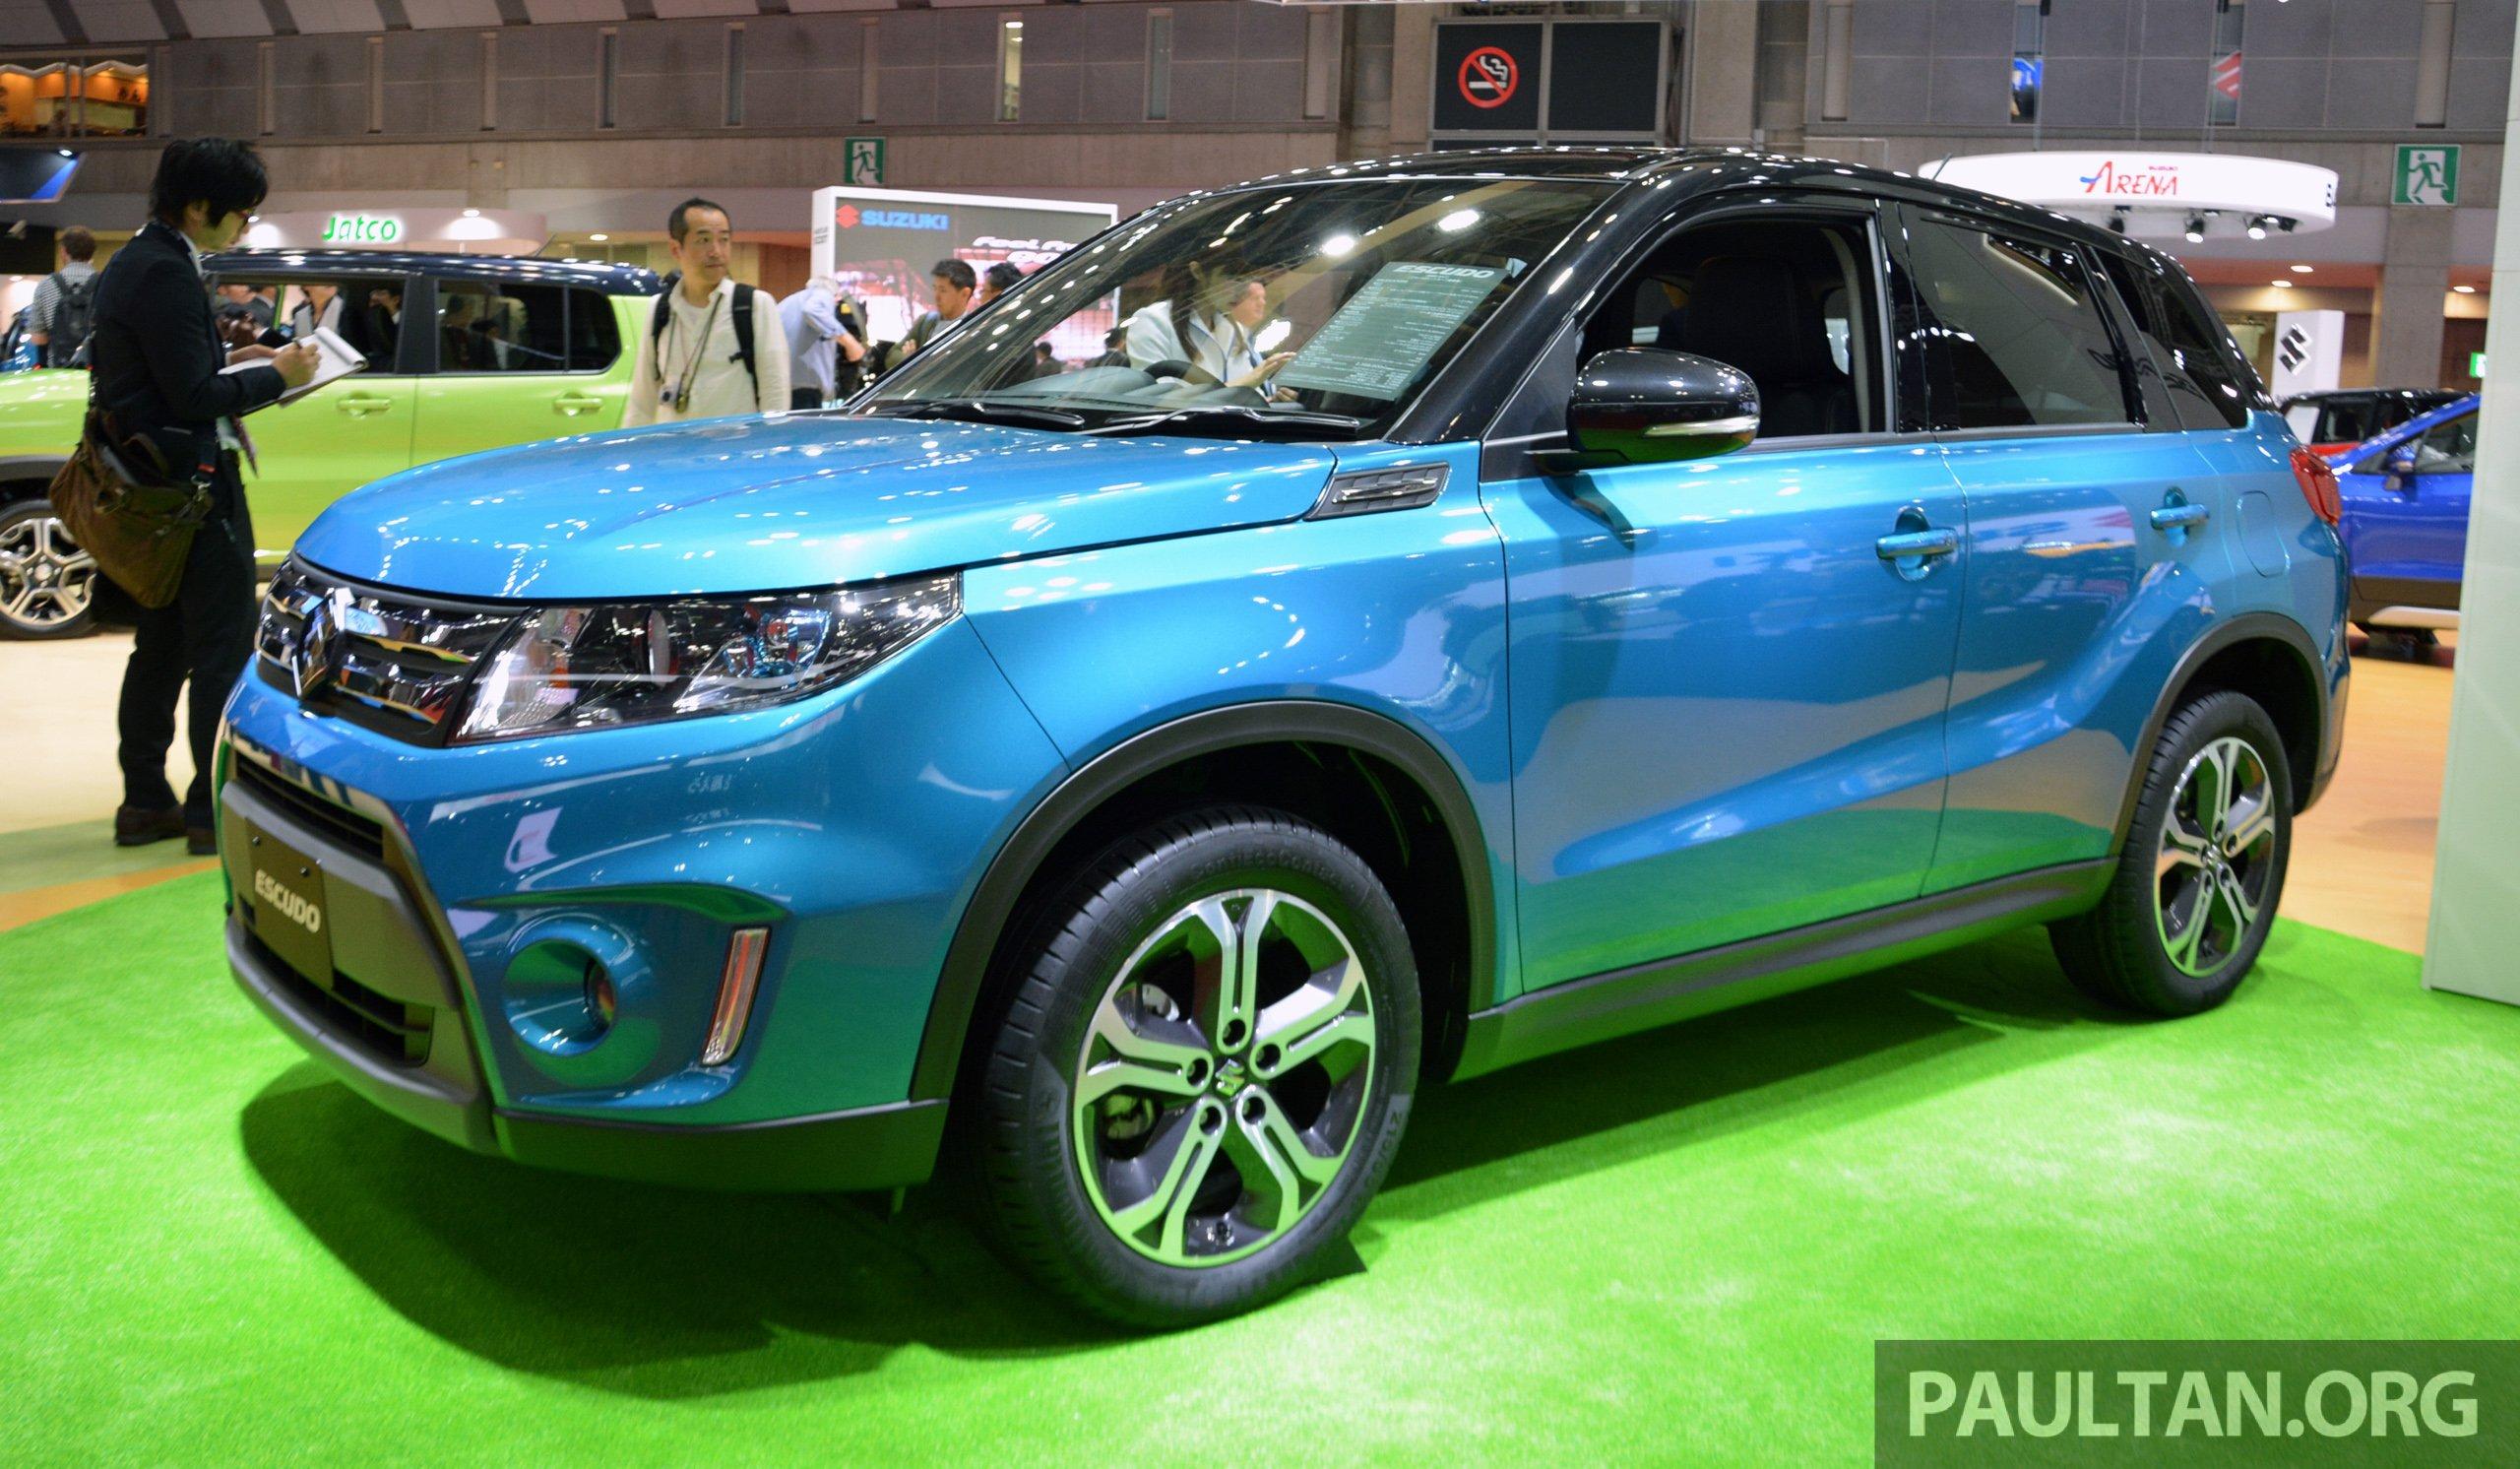 Proton Suv Rendering Based On The Suzuki Vitara Image